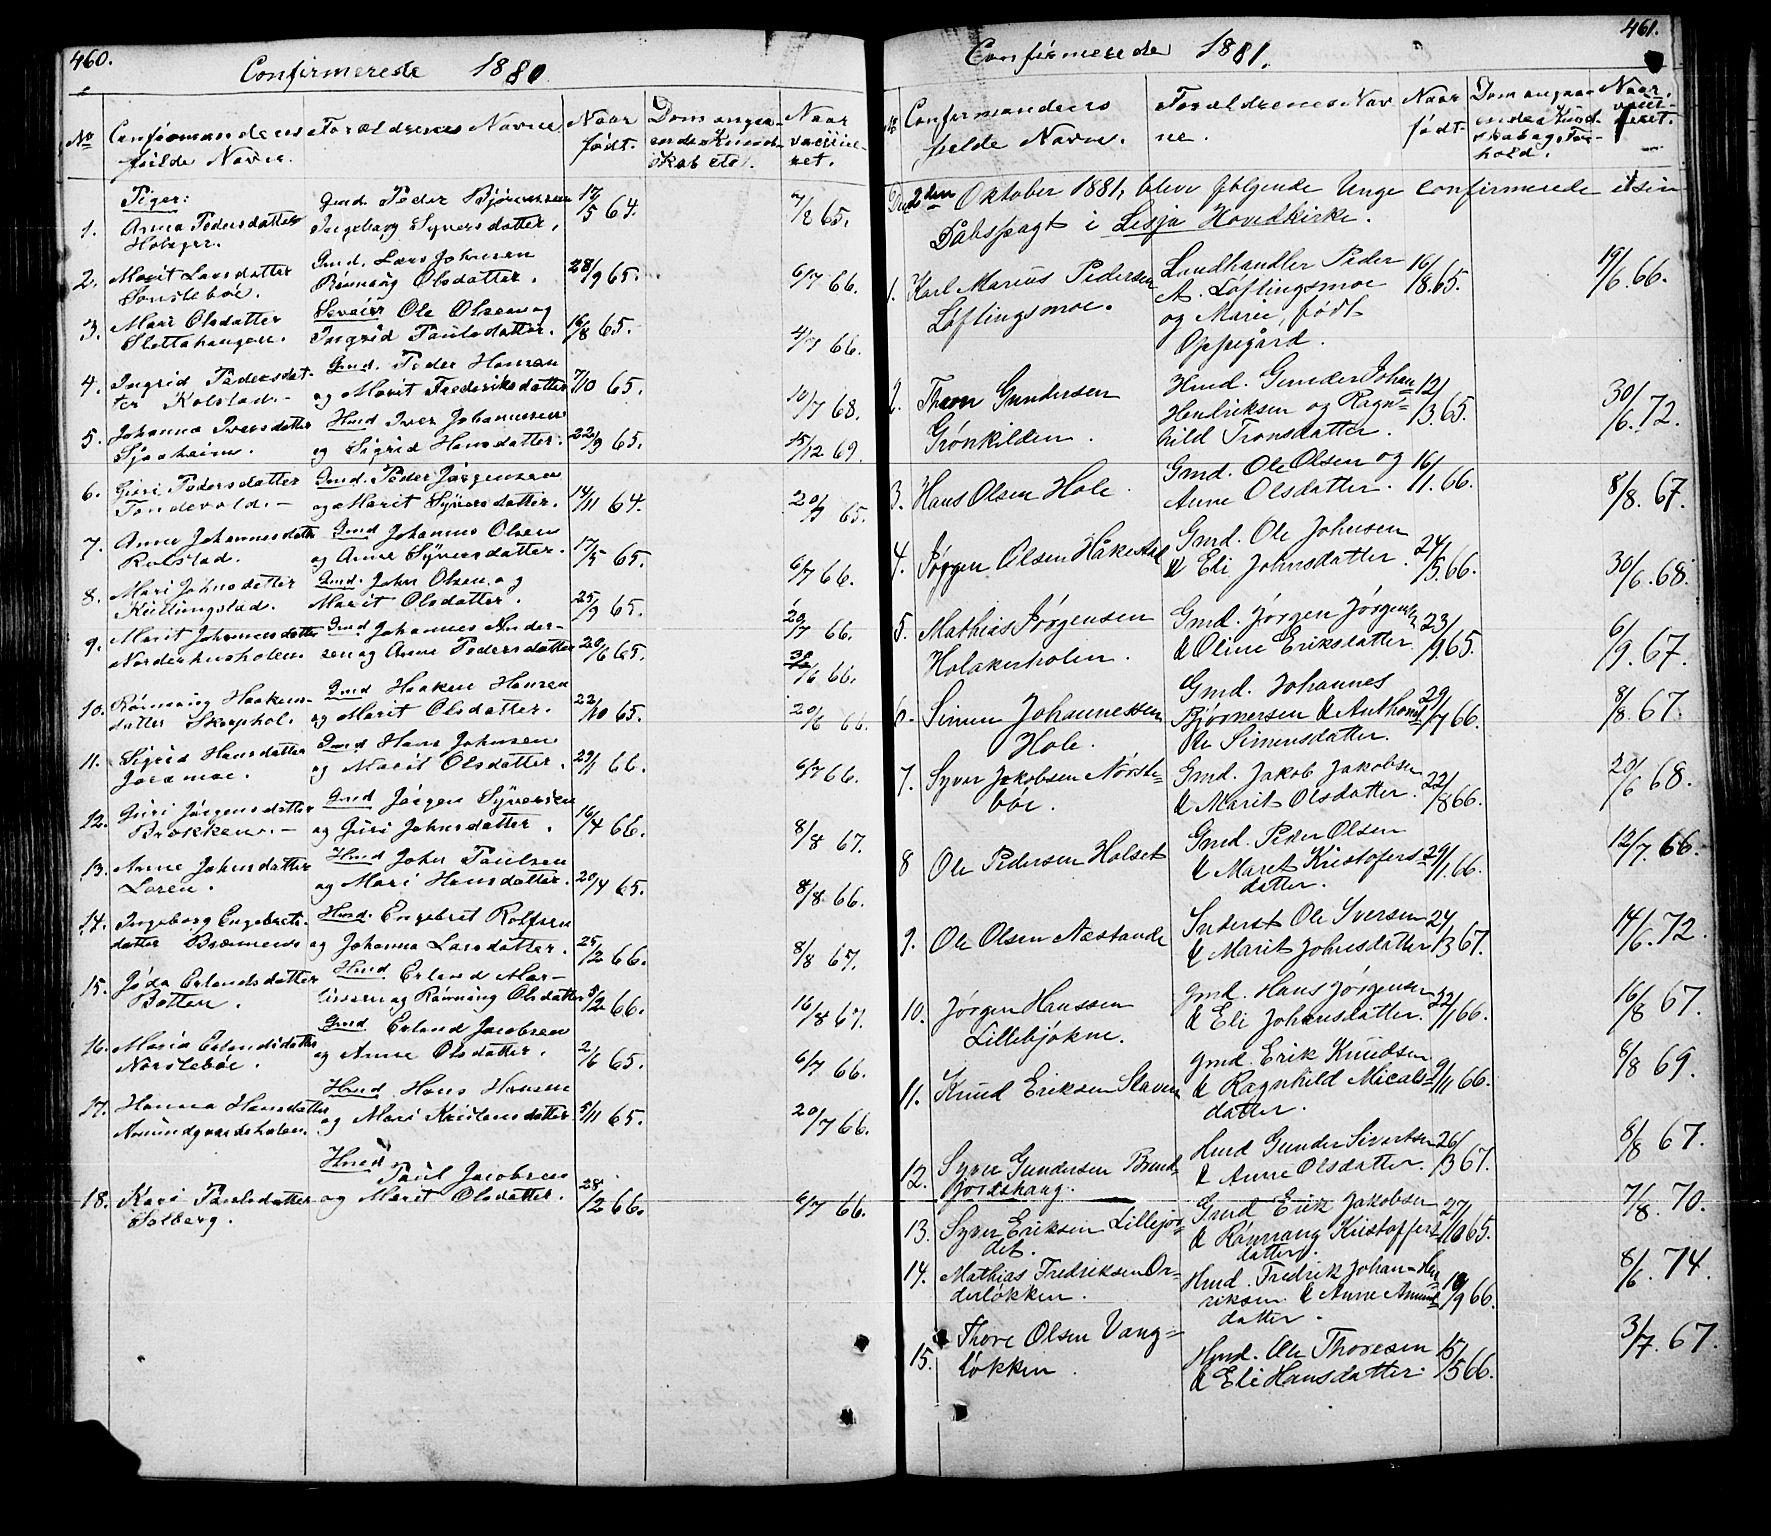 SAH, Lesja prestekontor, Klokkerbok nr. 5, 1850-1894, s. 460-461